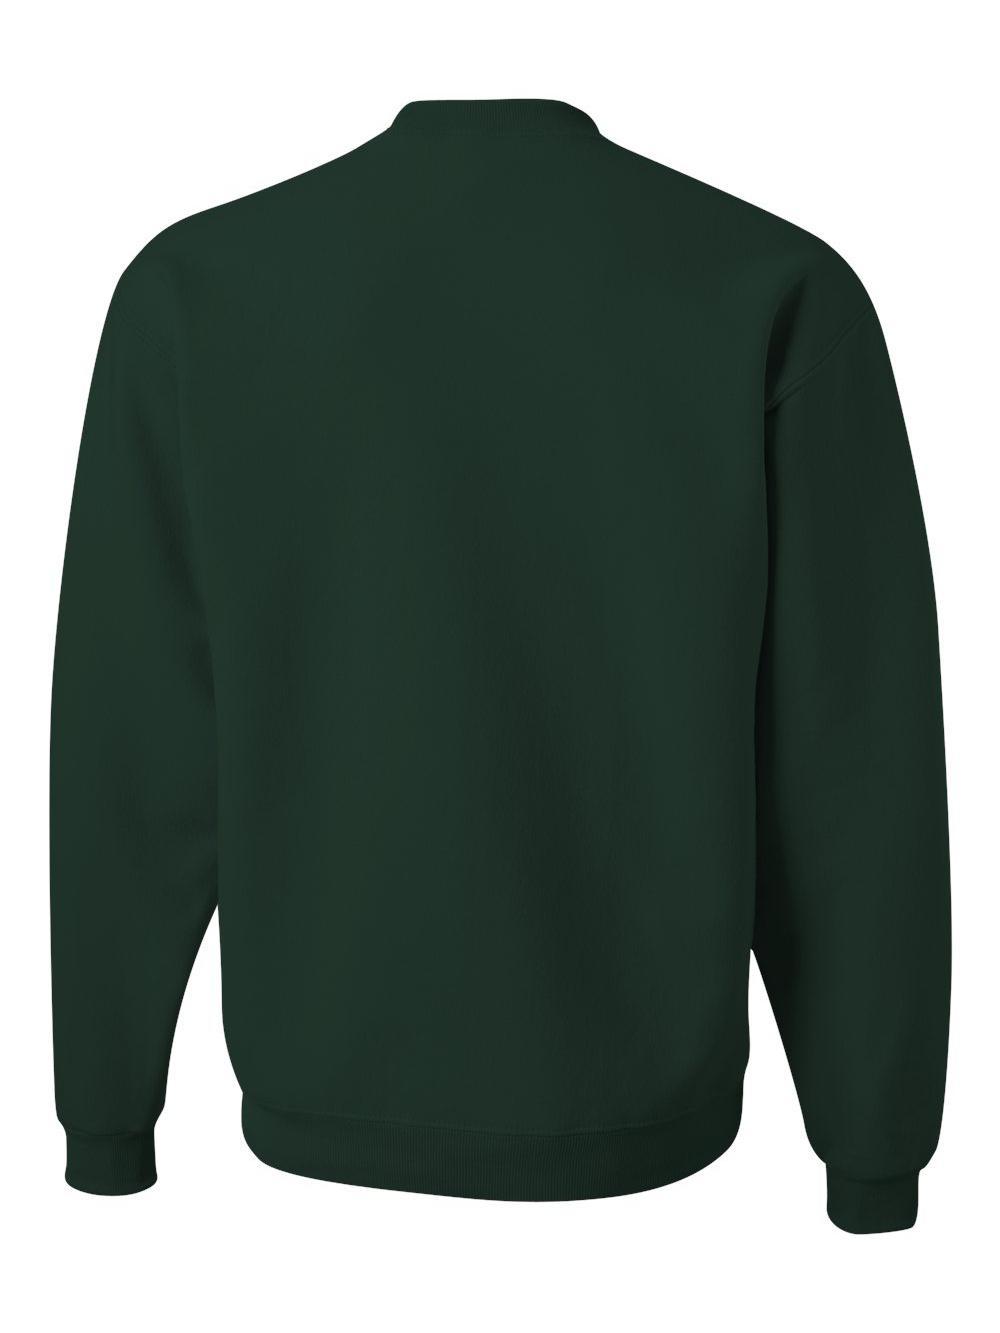 Jerzees-NuBlend-Crewneck-Sweatshirt-562MR thumbnail 40